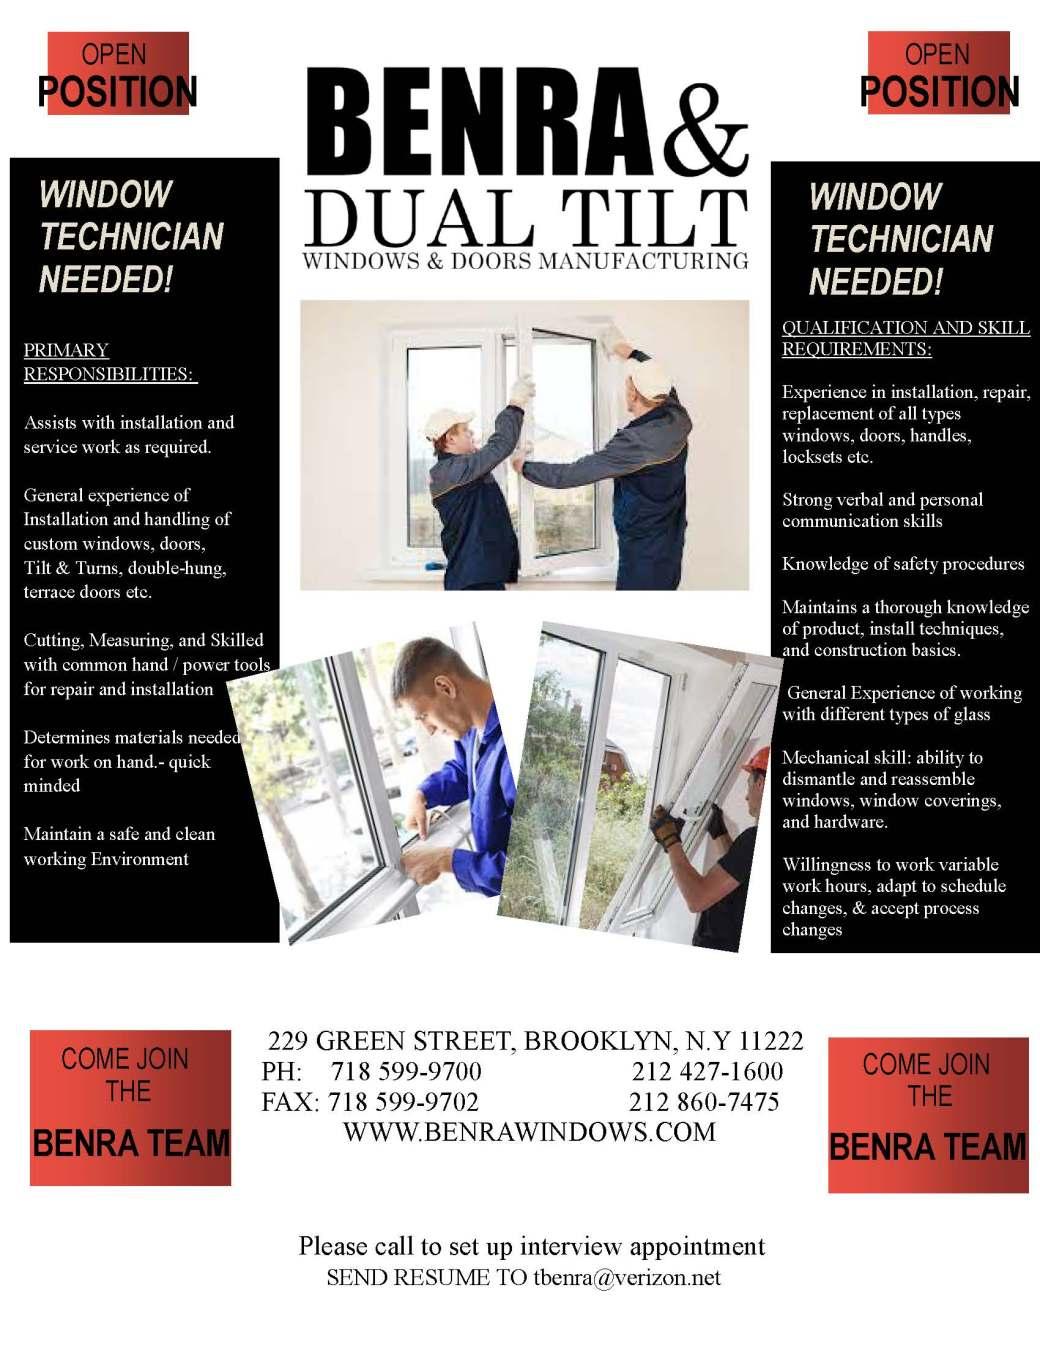 BENRA & DUAL TILT WINDOWS & DOORS FLYER